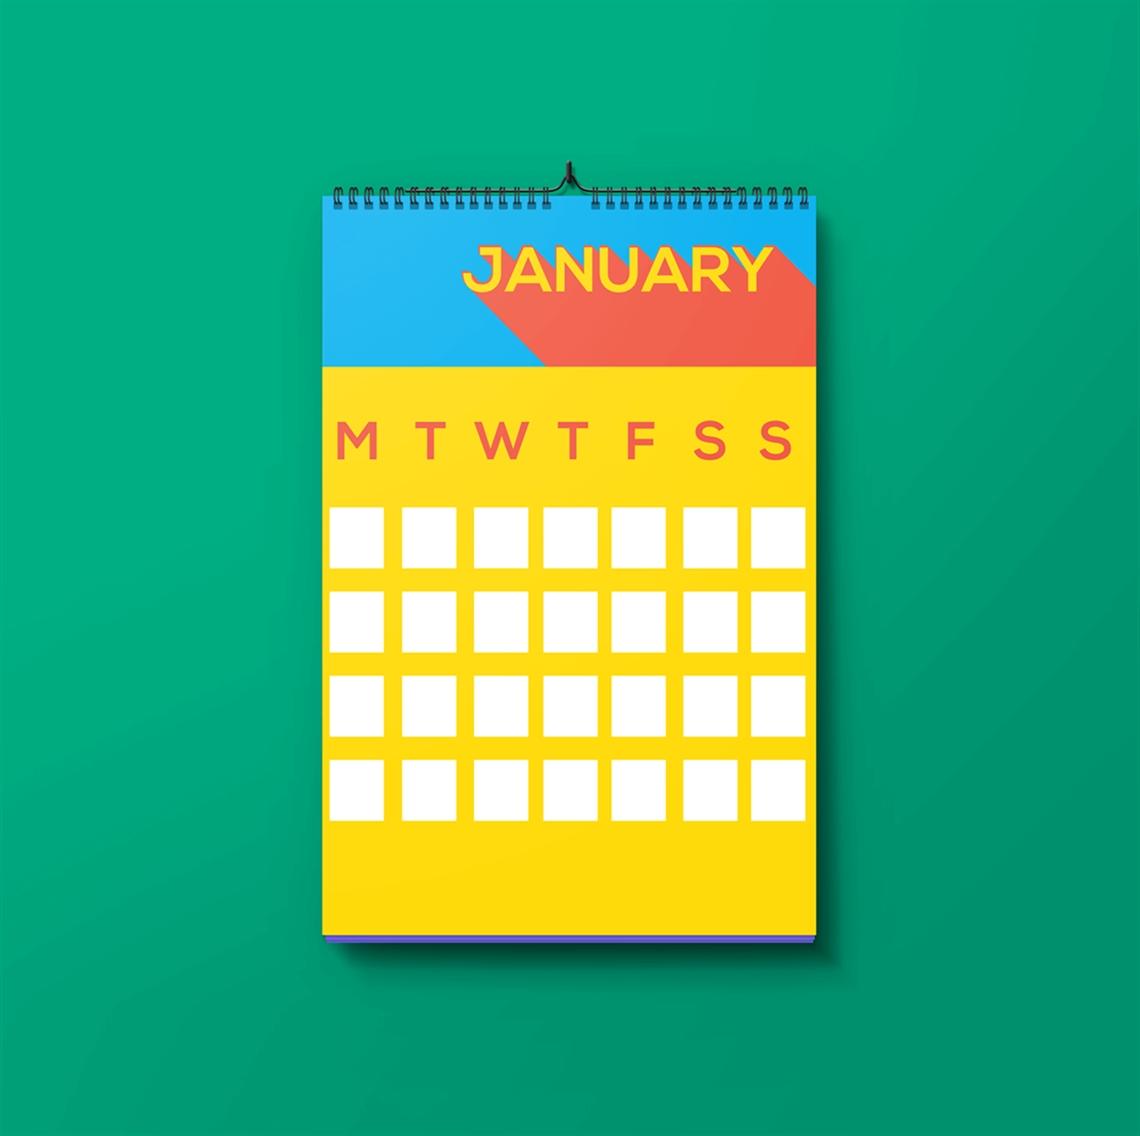 Upload Your Own Calendarcustom Wall Calendar Printing | A4 Or A5_A4 Wall Calendar Printing